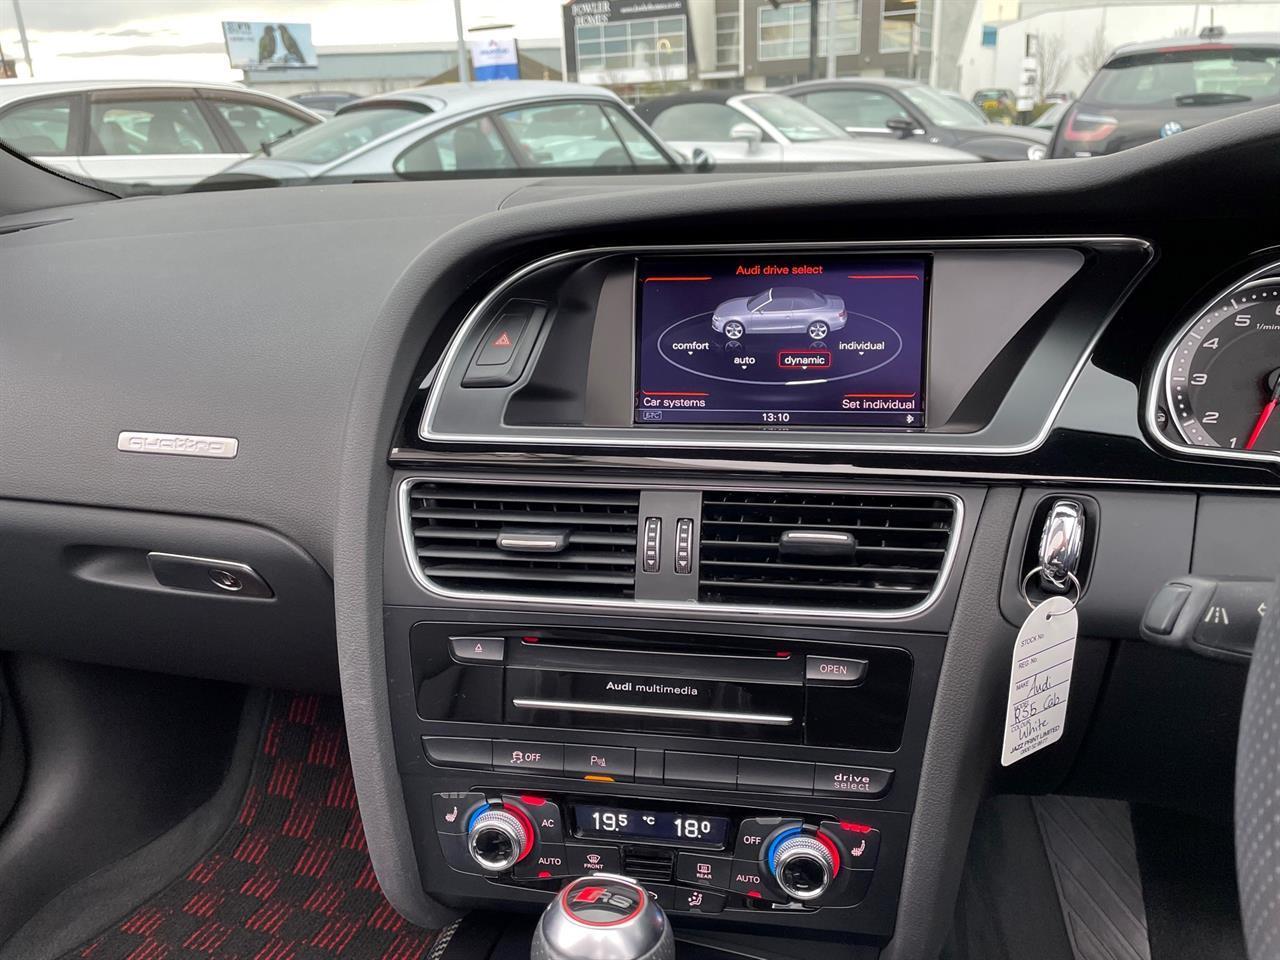 image-9, 2013 Audi RS5 4.2 V8 FSI Facelift Convertible at Christchurch